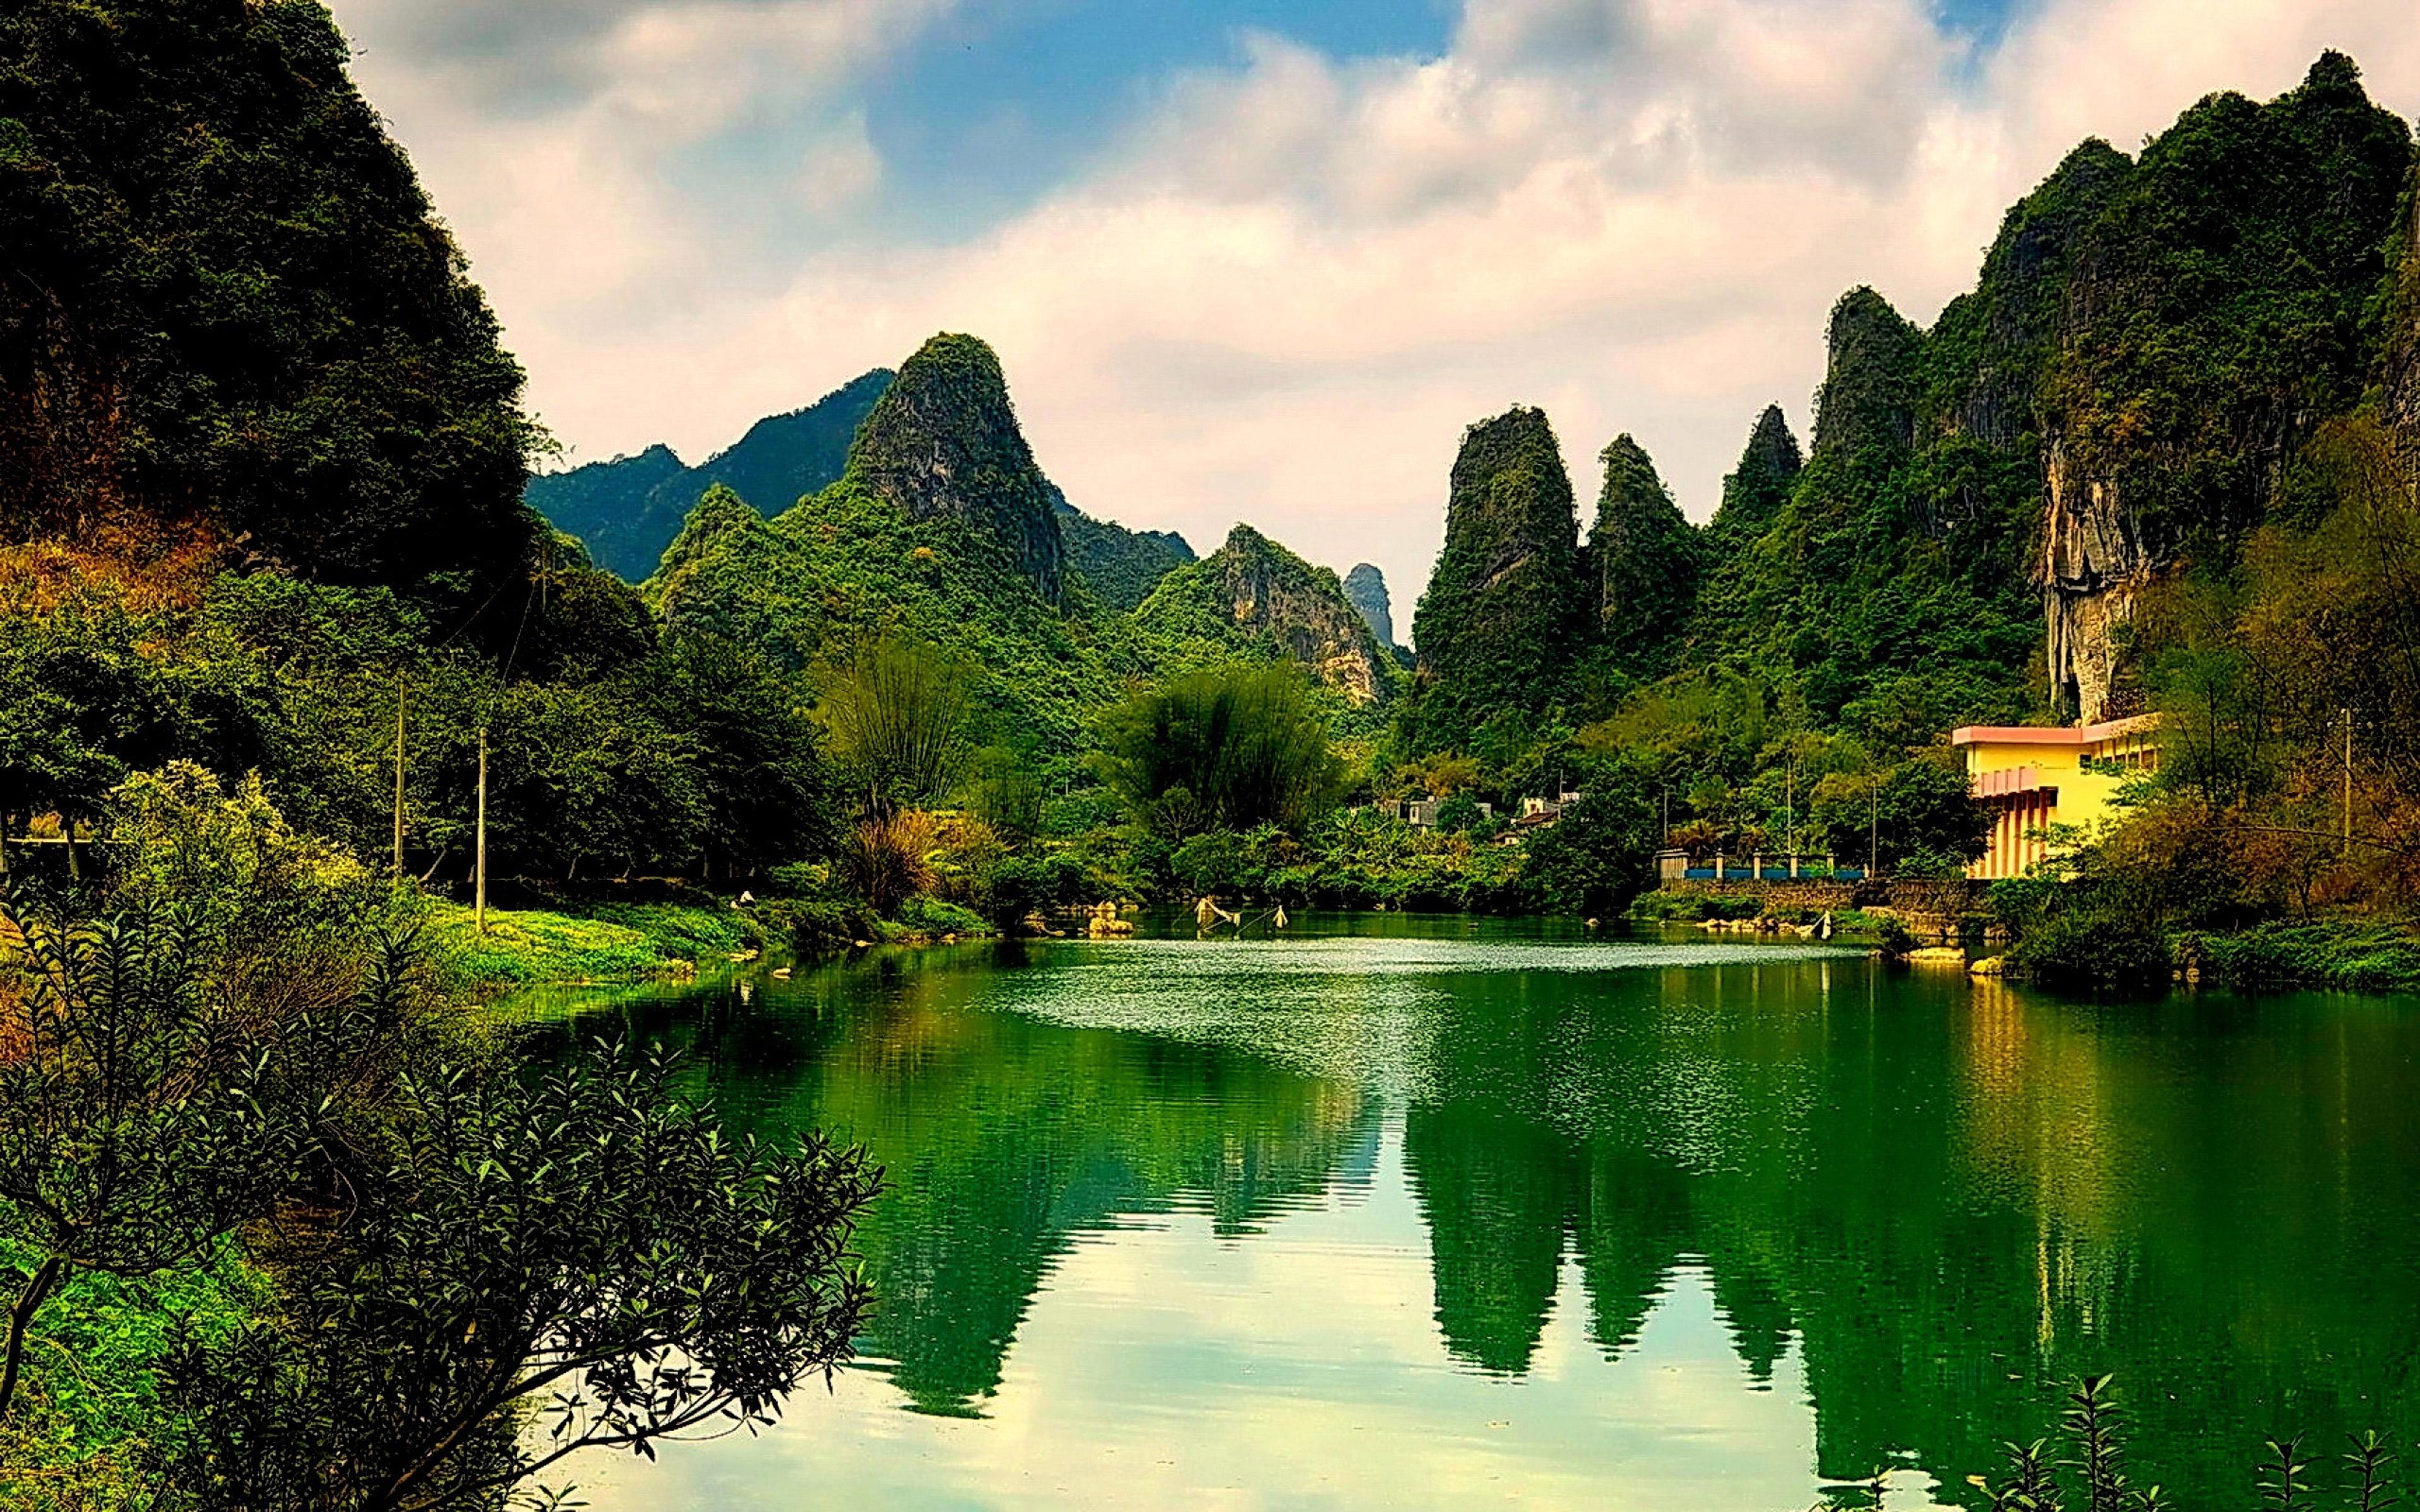 Nature Green Lake Hd Wallpaper  Wallpapers13com